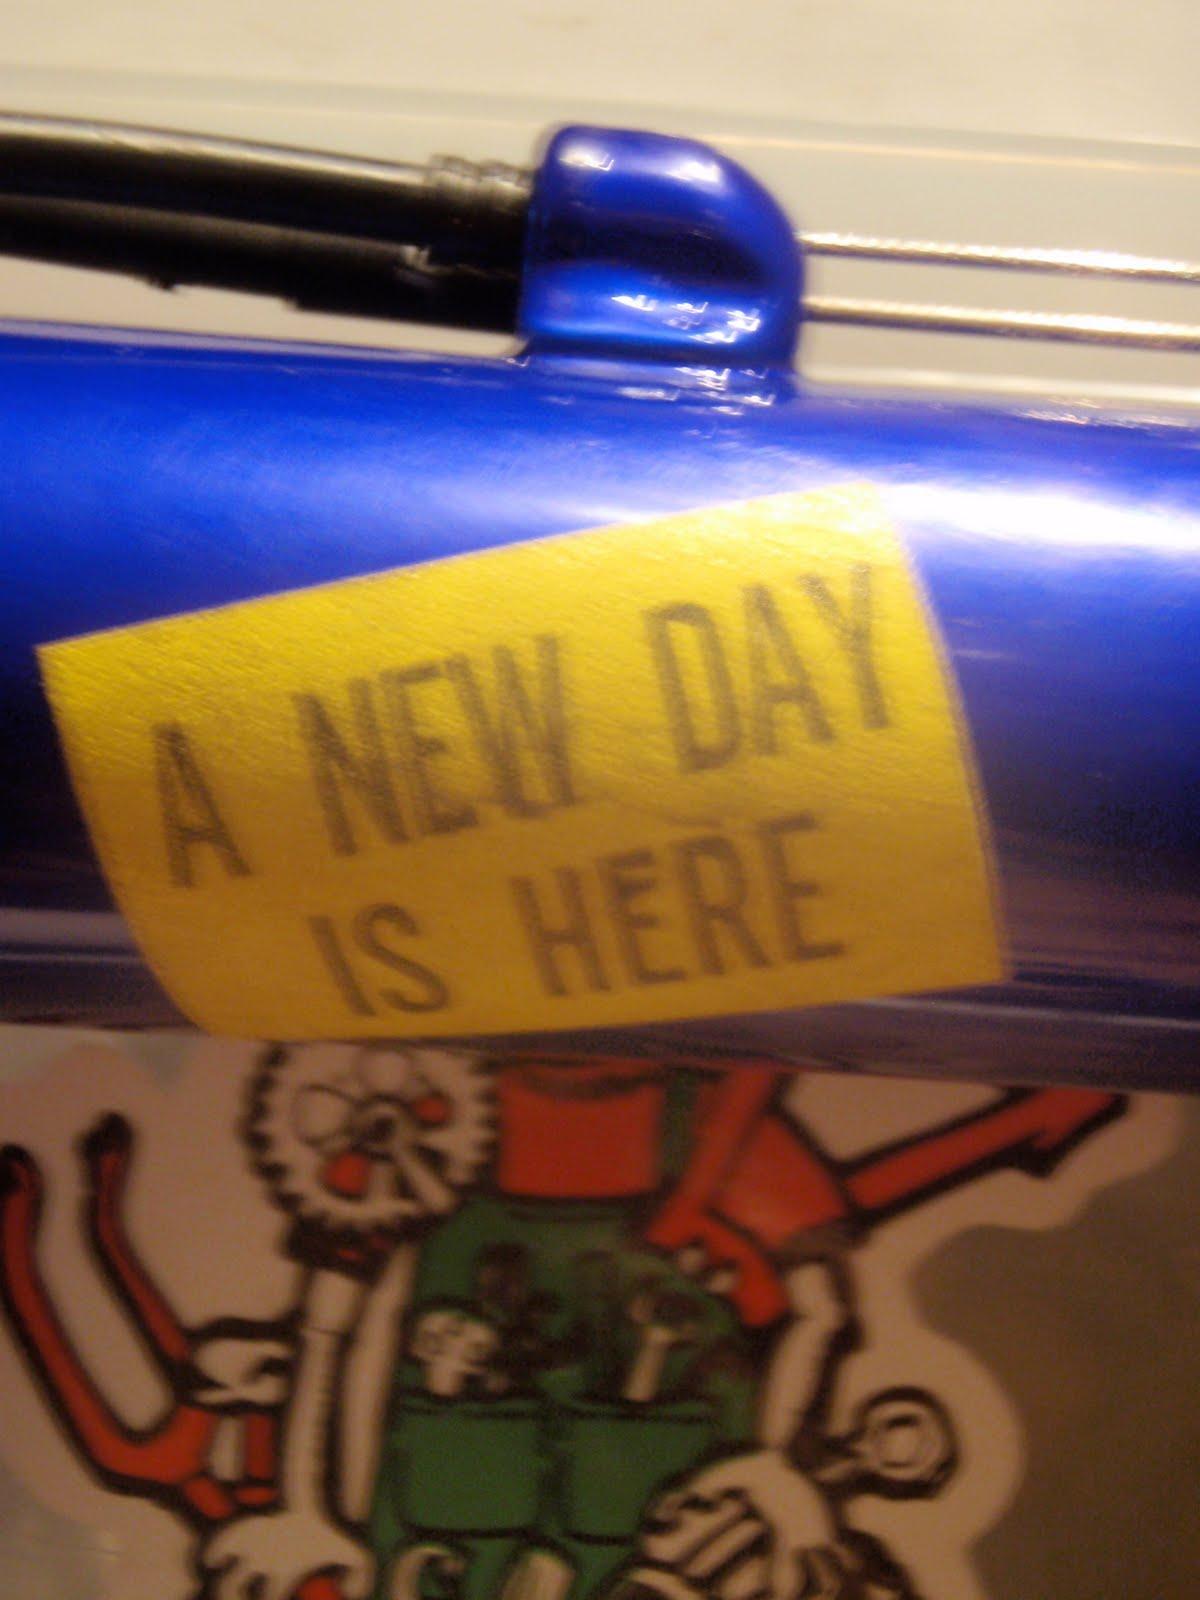 http://1.bp.blogspot.com/_wb8bAl1P-N0/TI4NvJqA-xI/AAAAAAAAQk0/5JvKd2e04Qw/s1600/new%2Bday.JPG